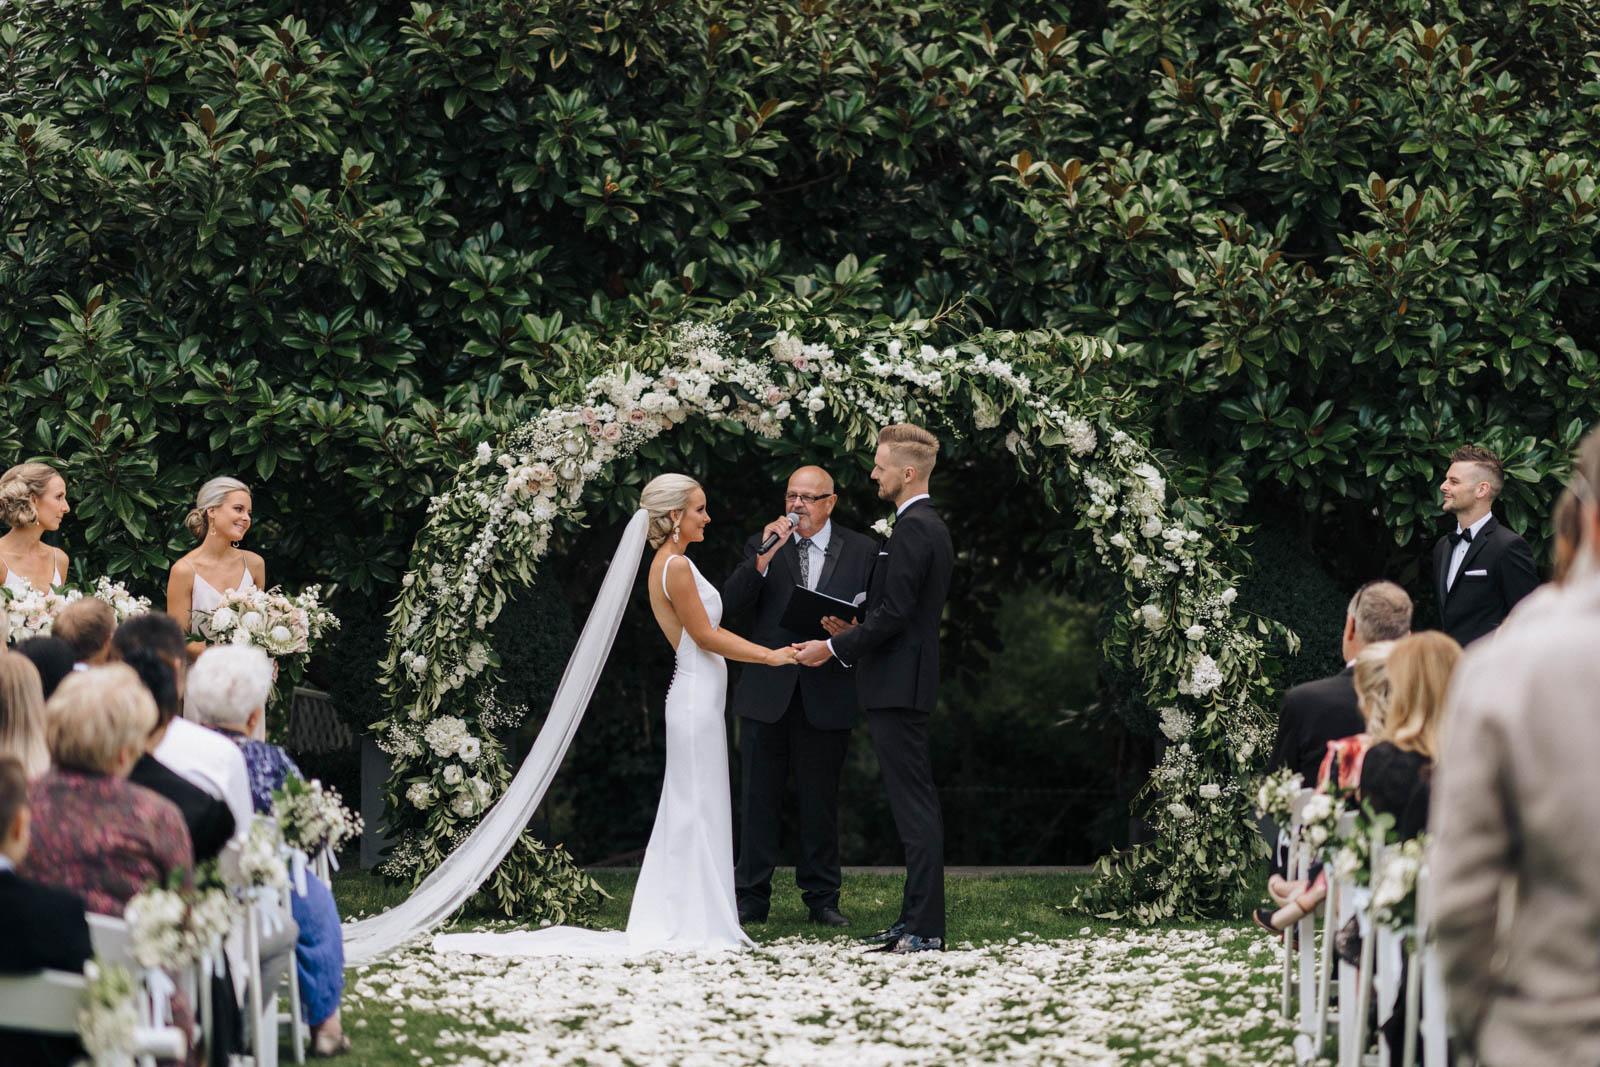 newfound-k-s-hilton-taupo-wedding-photographer-033